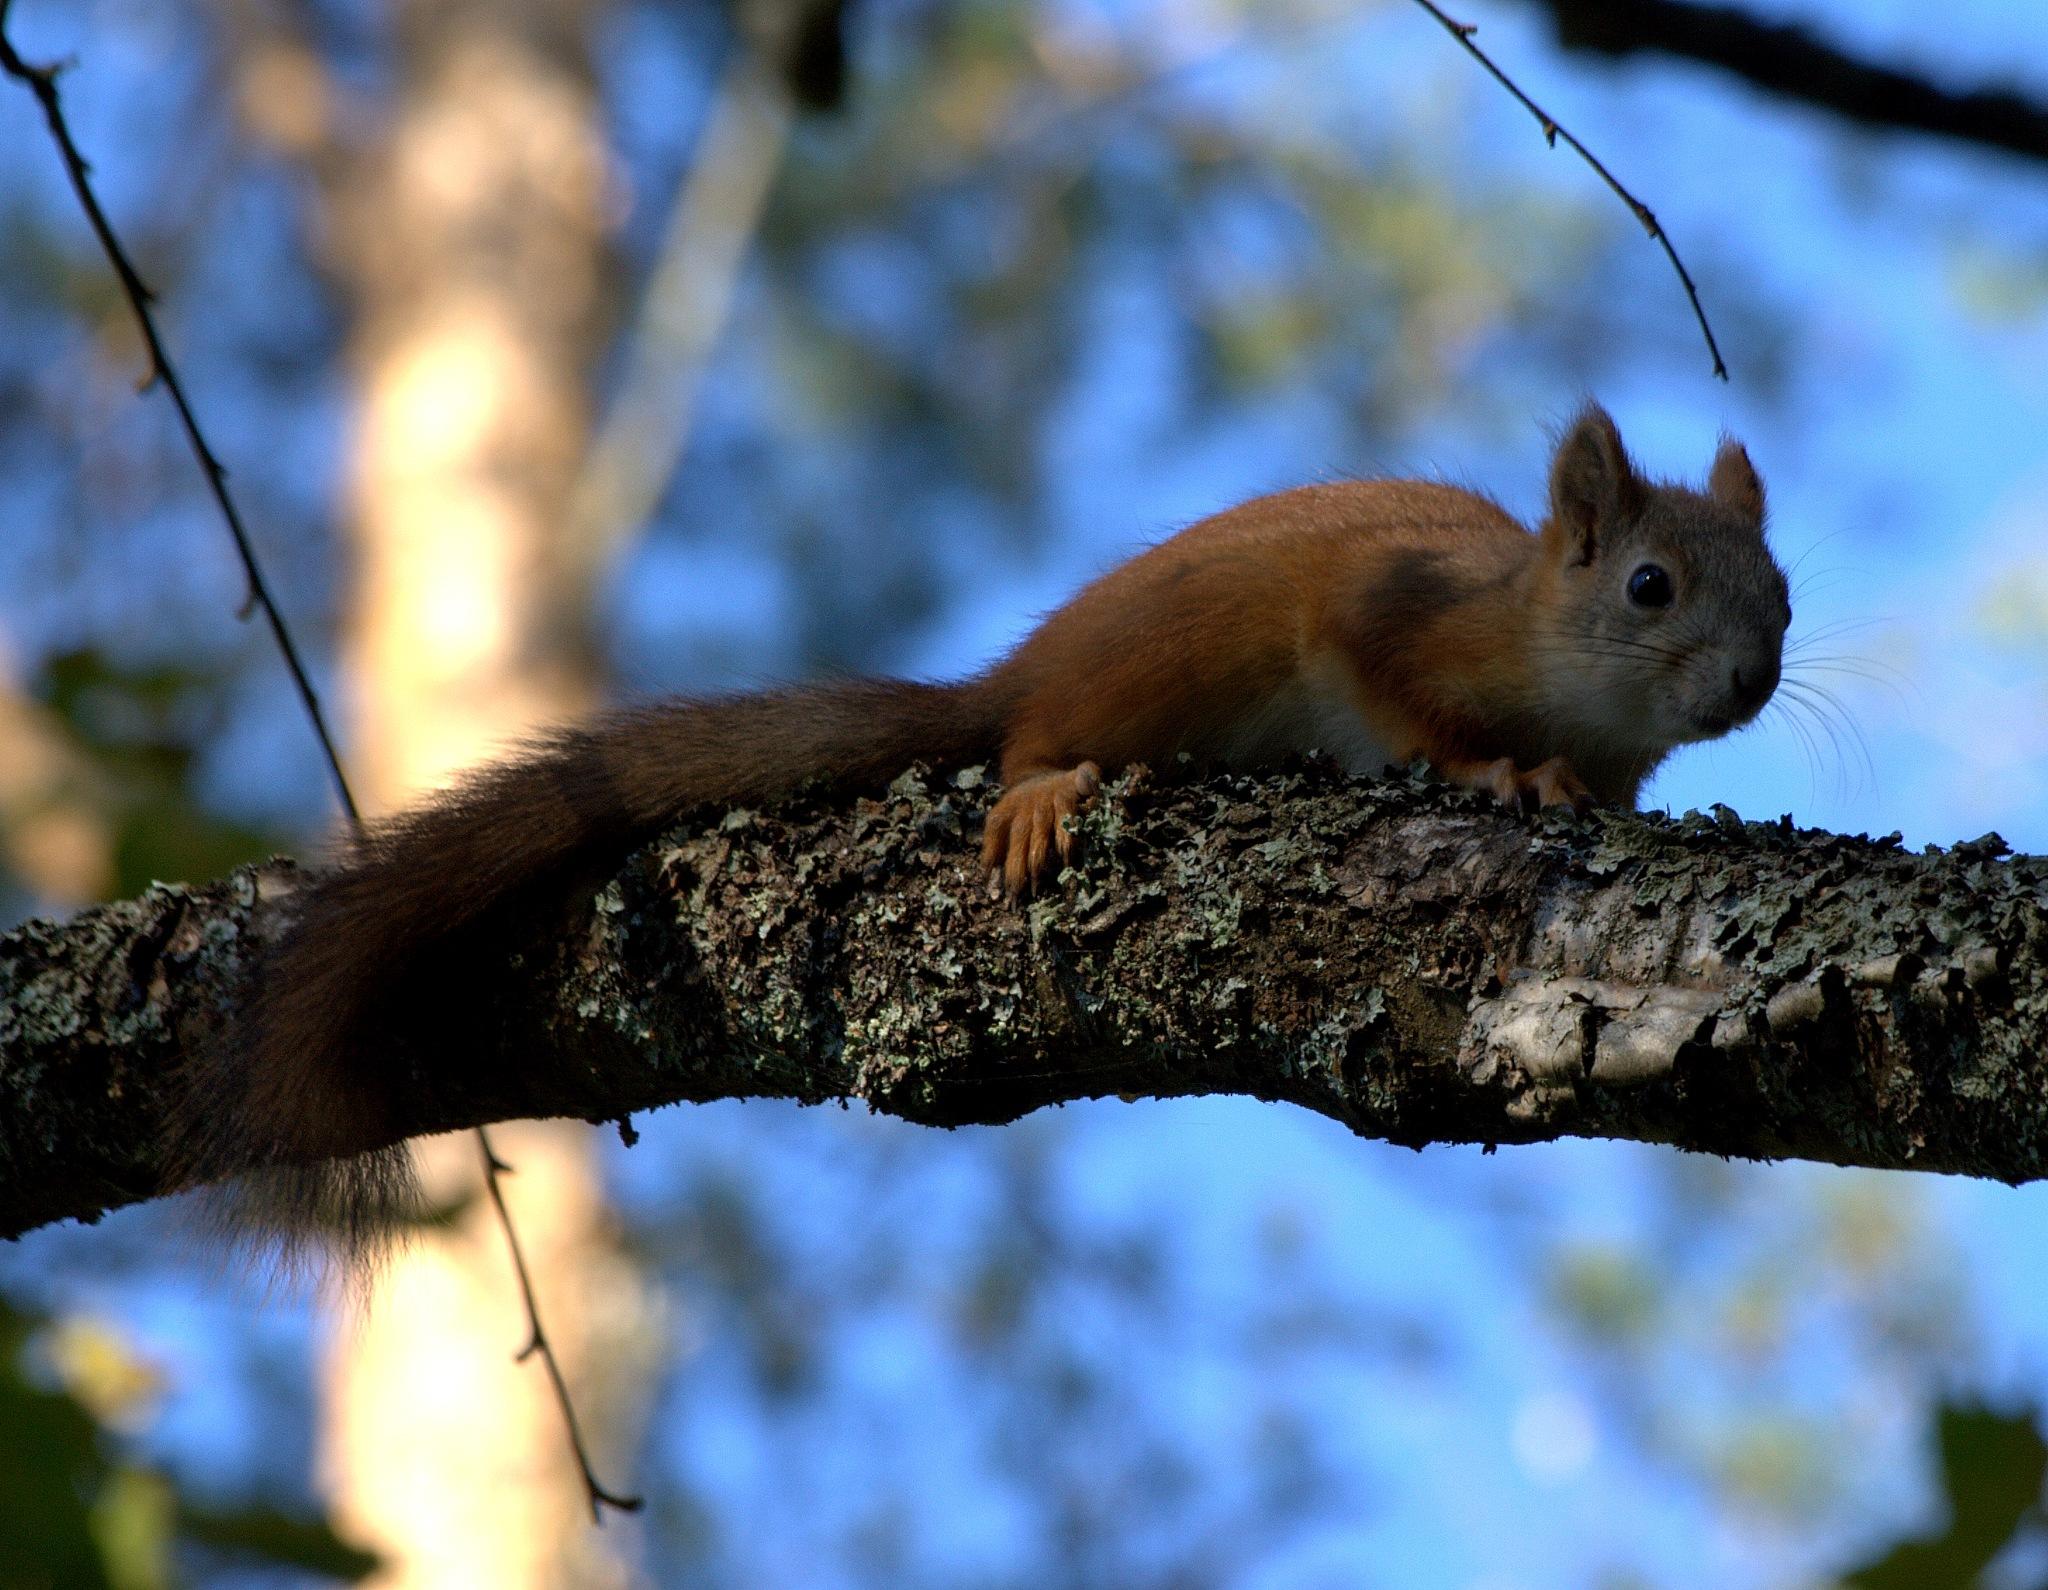 Autumn first squirrelguest by antsatykkylainen